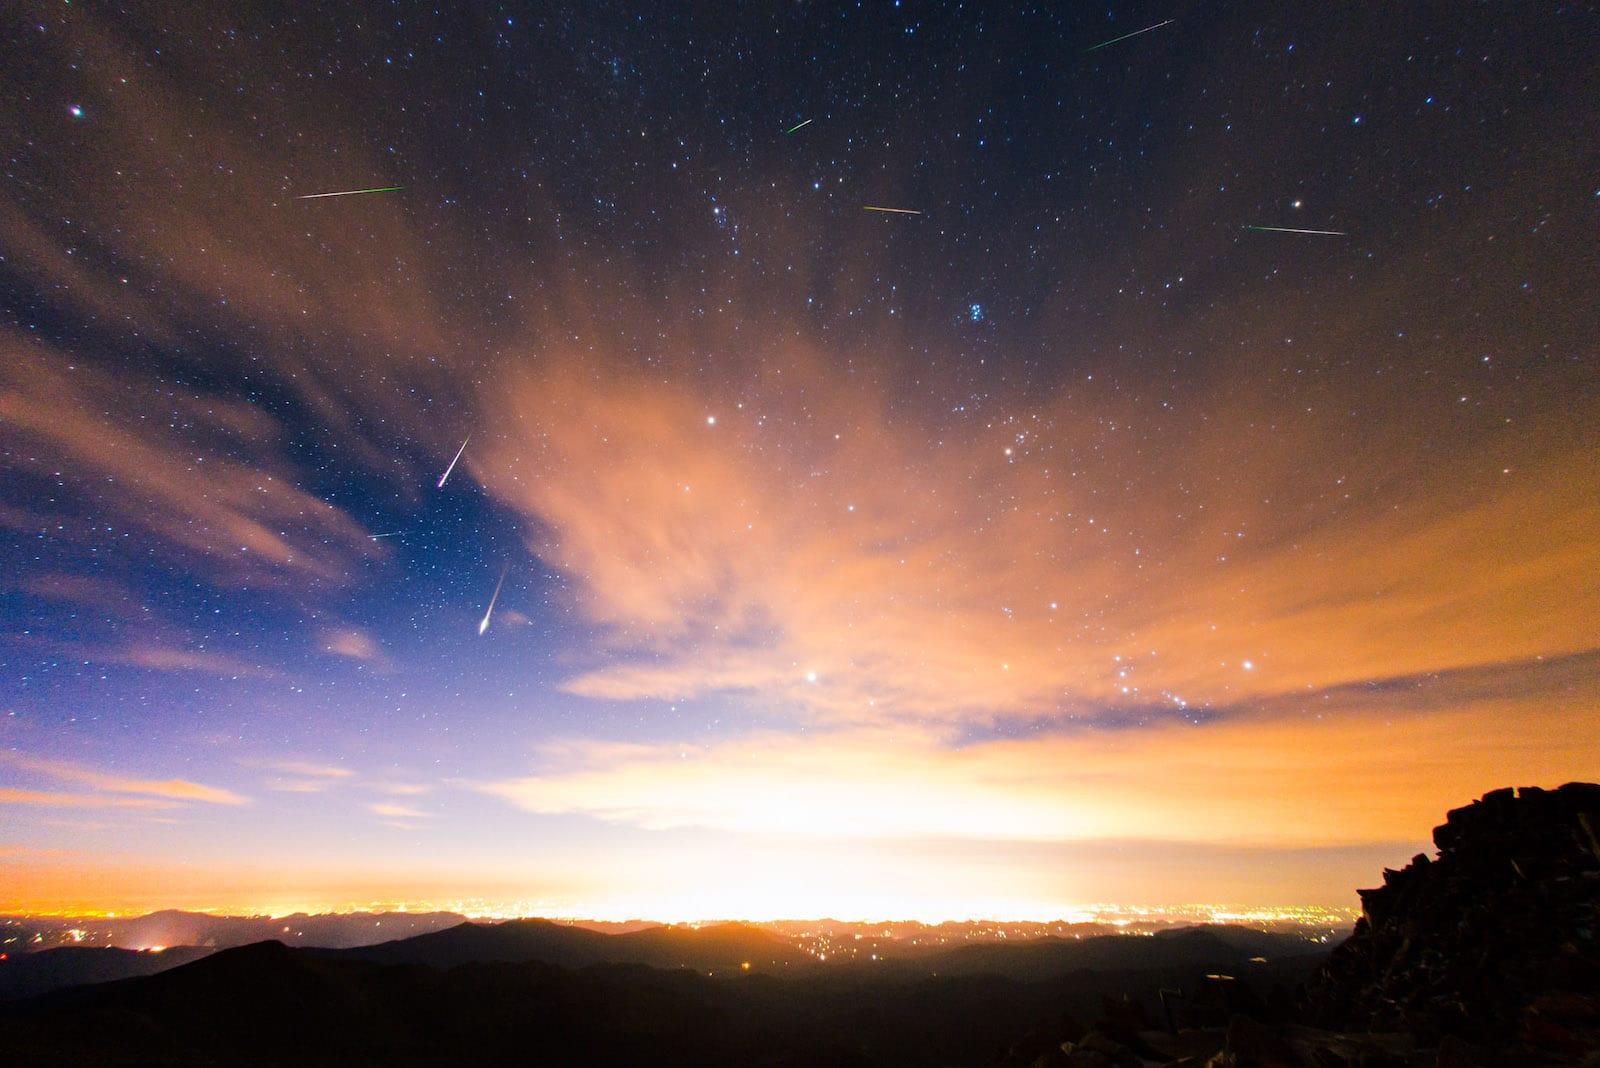 Mount Evans Meteor Shower Perseids from Mount Evans Colorado